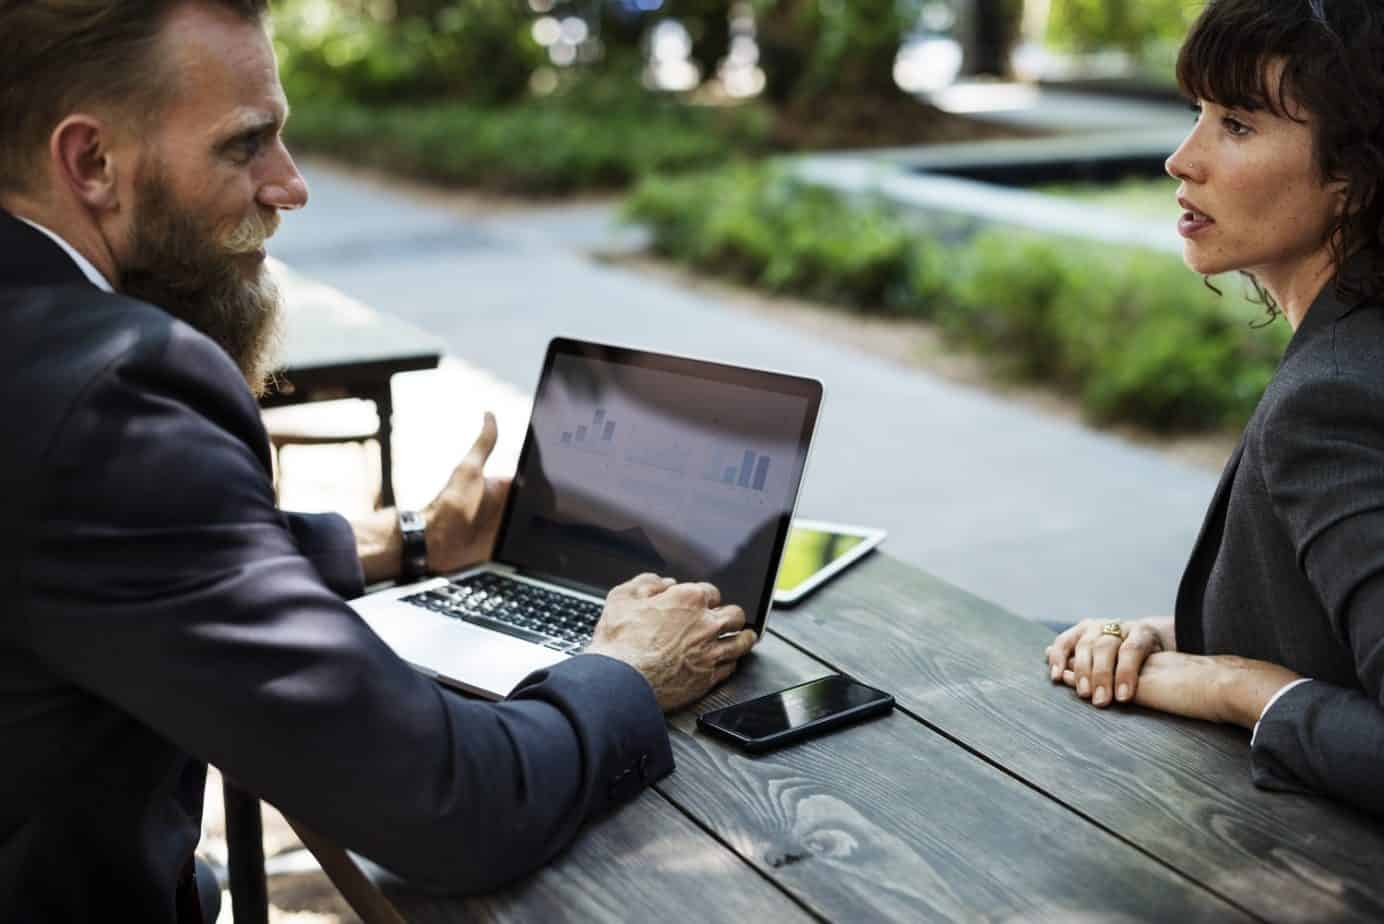 Man on a laptop talking to a woman